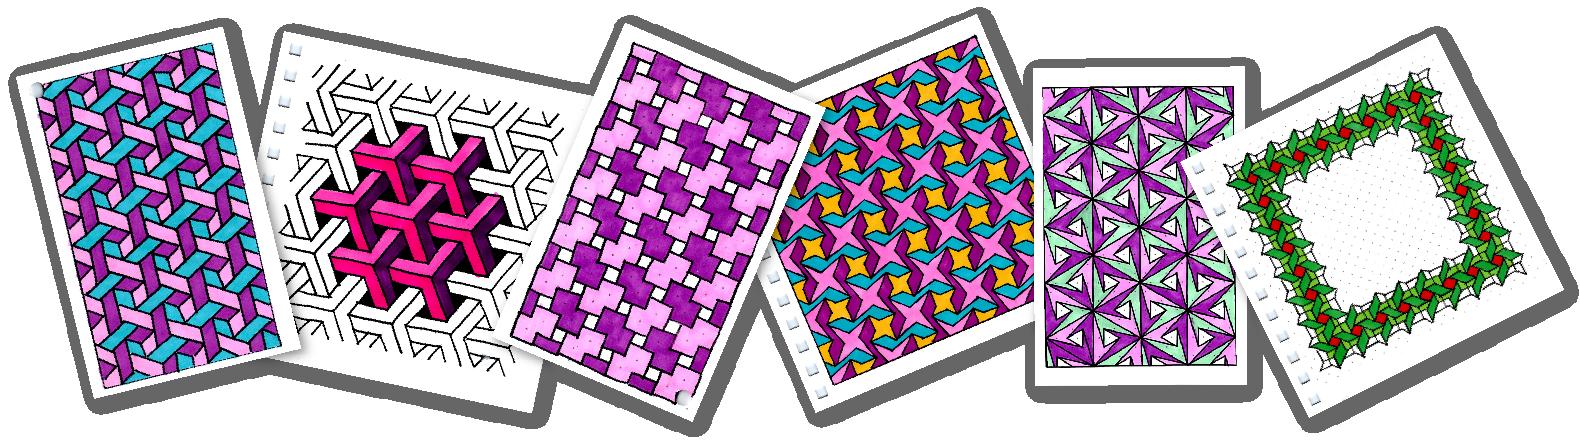 Hand Drawn DIY Coloring Patterns